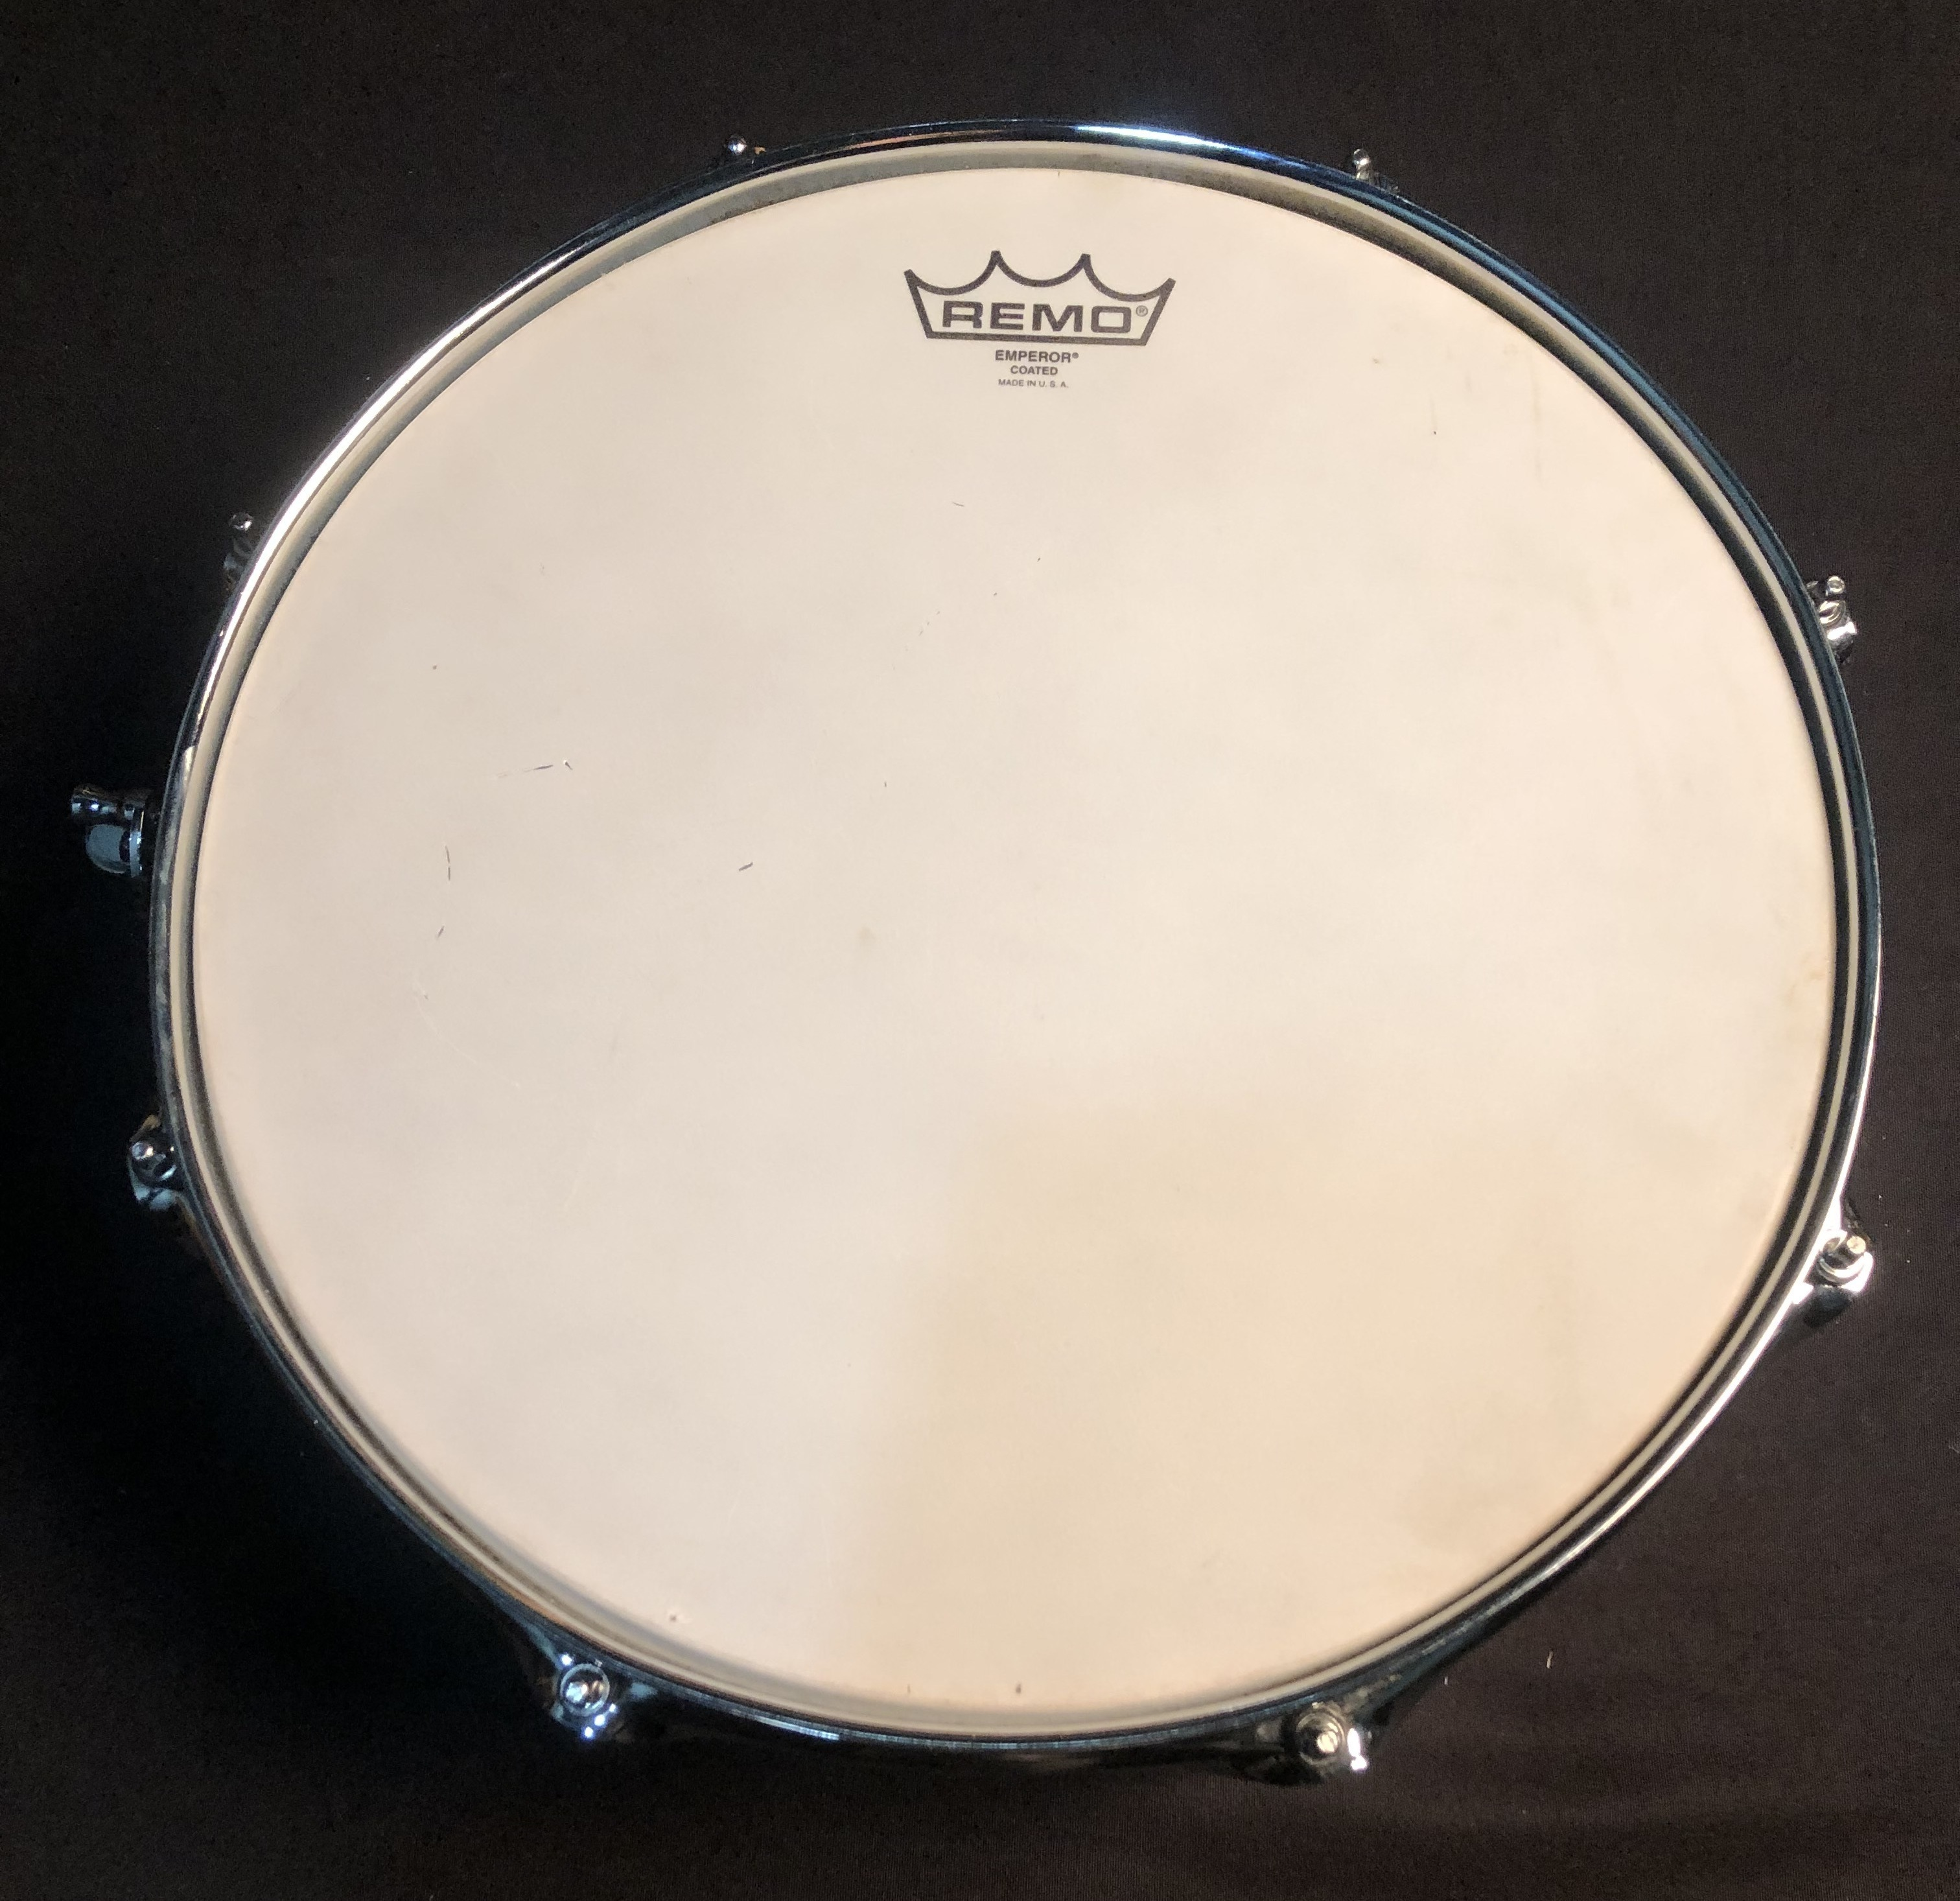 CANOPUS - Yaiba Snare Drum 14